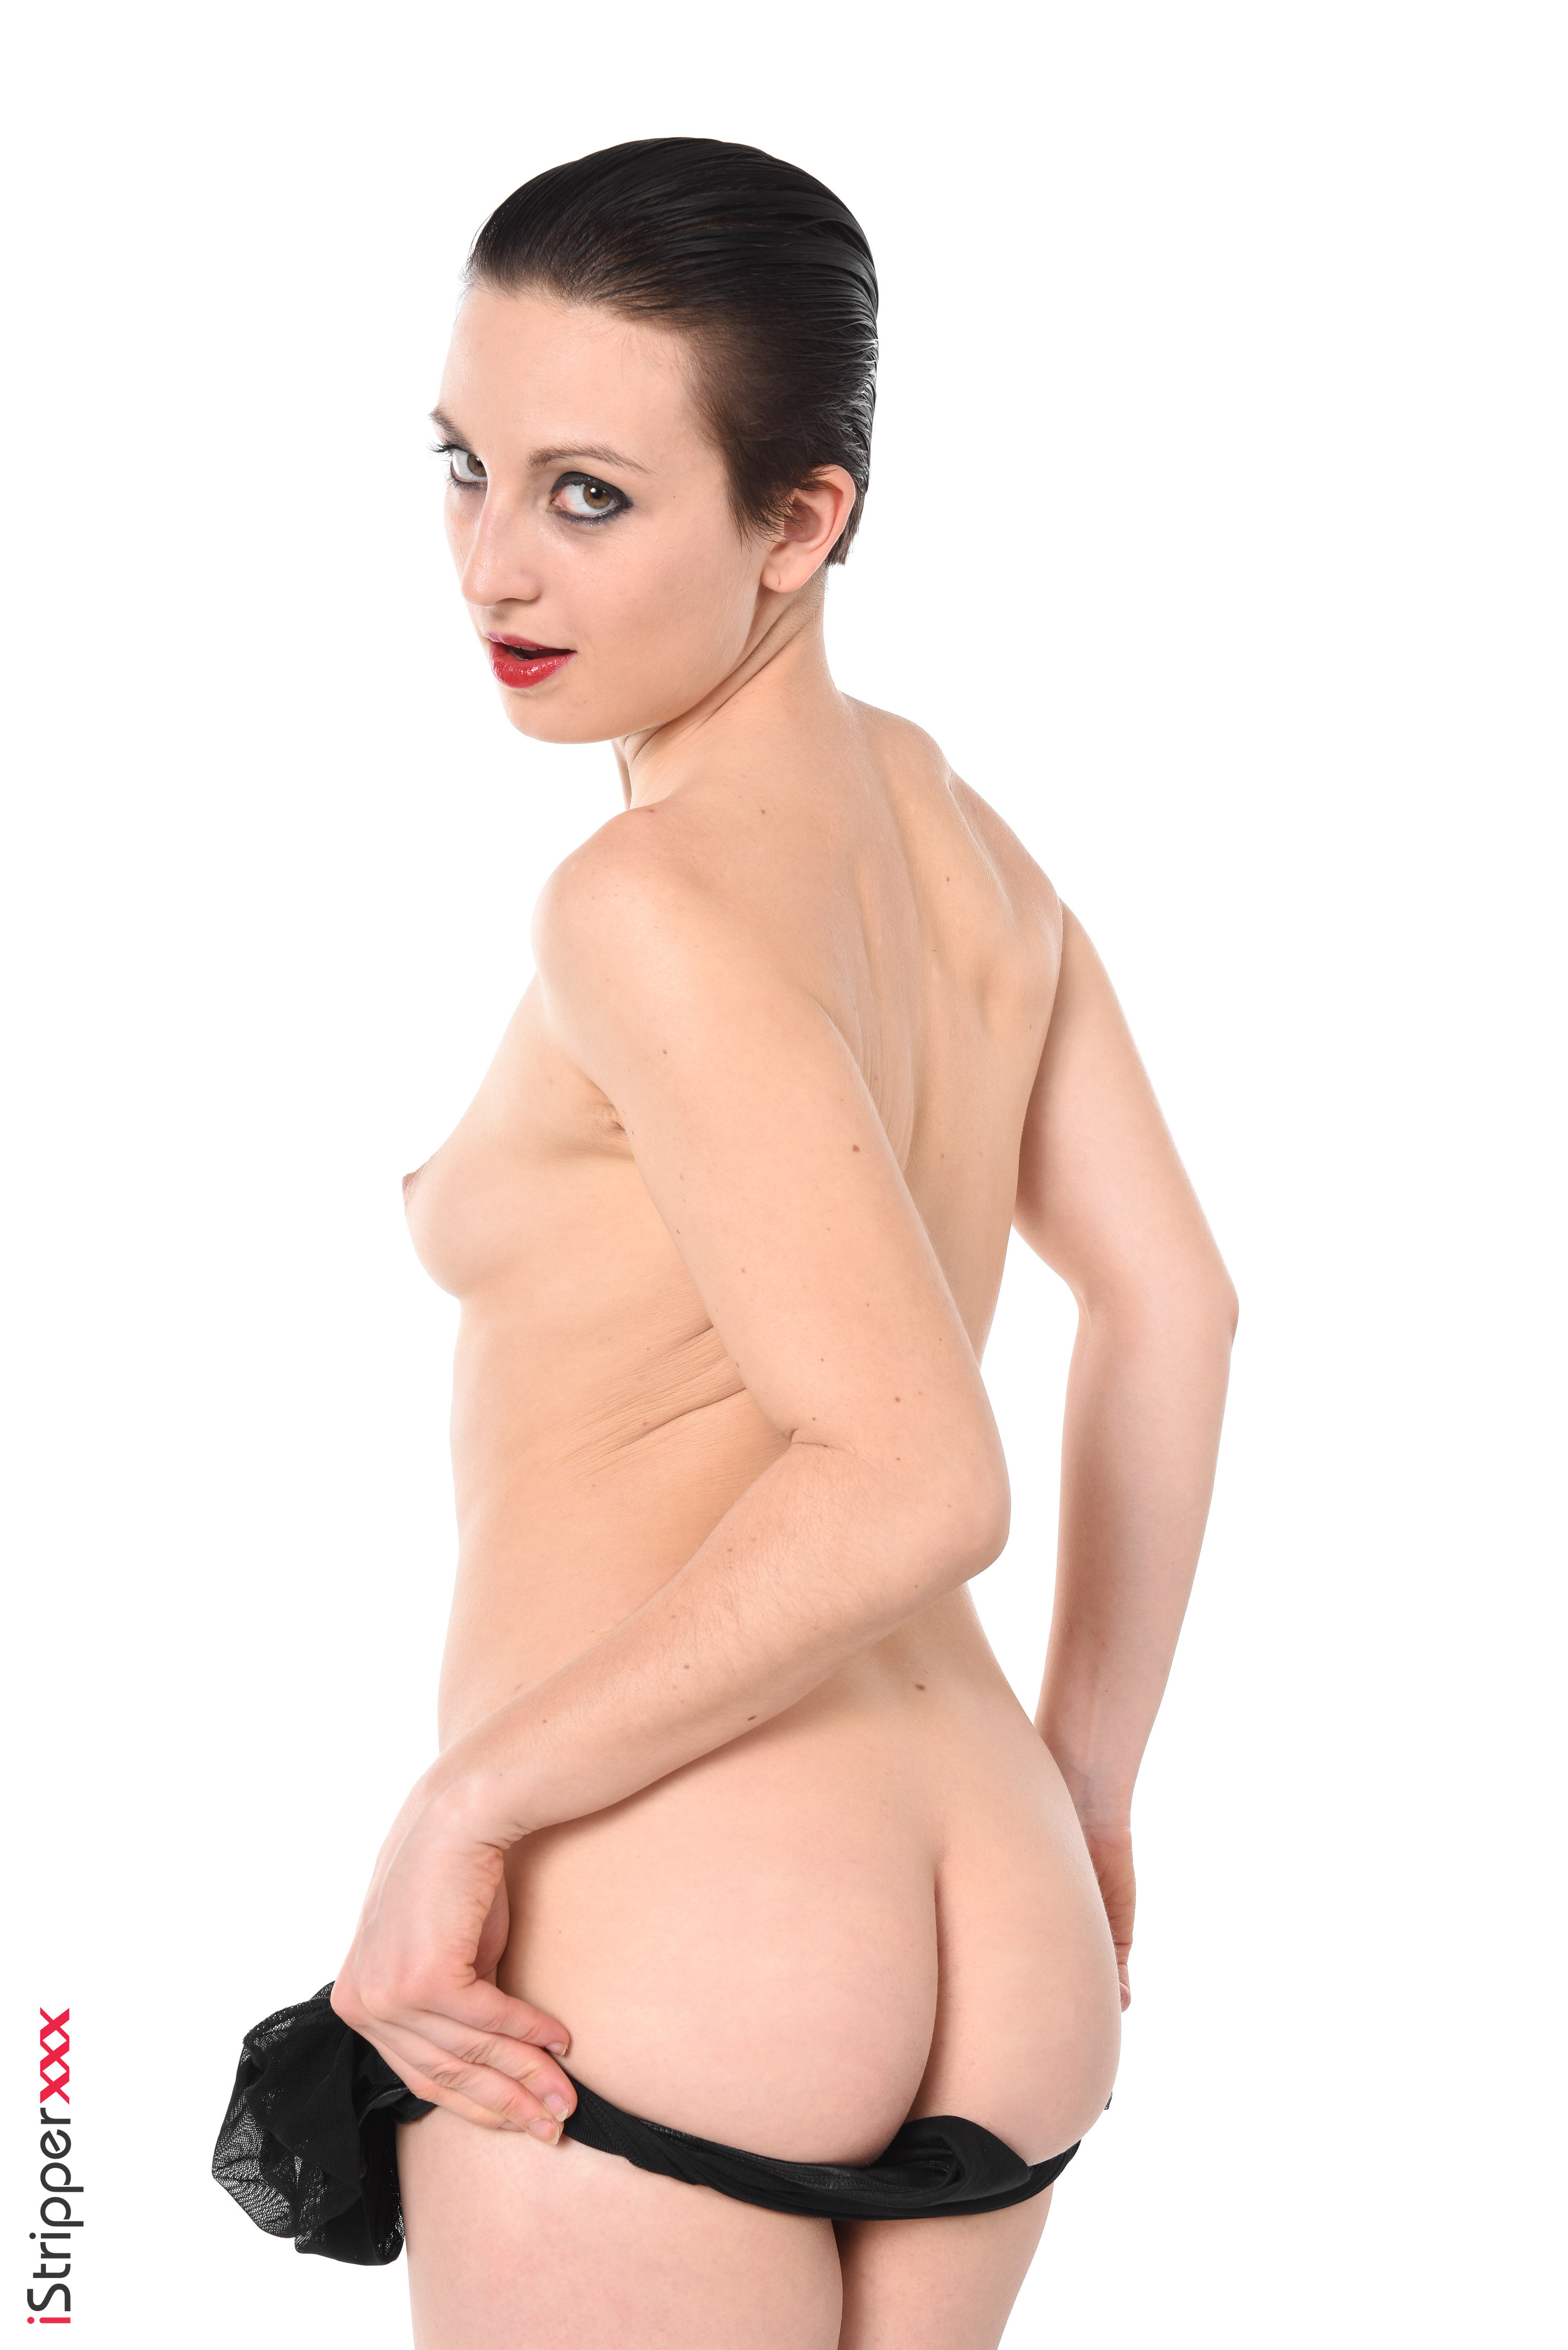 sexy girl naked striptease